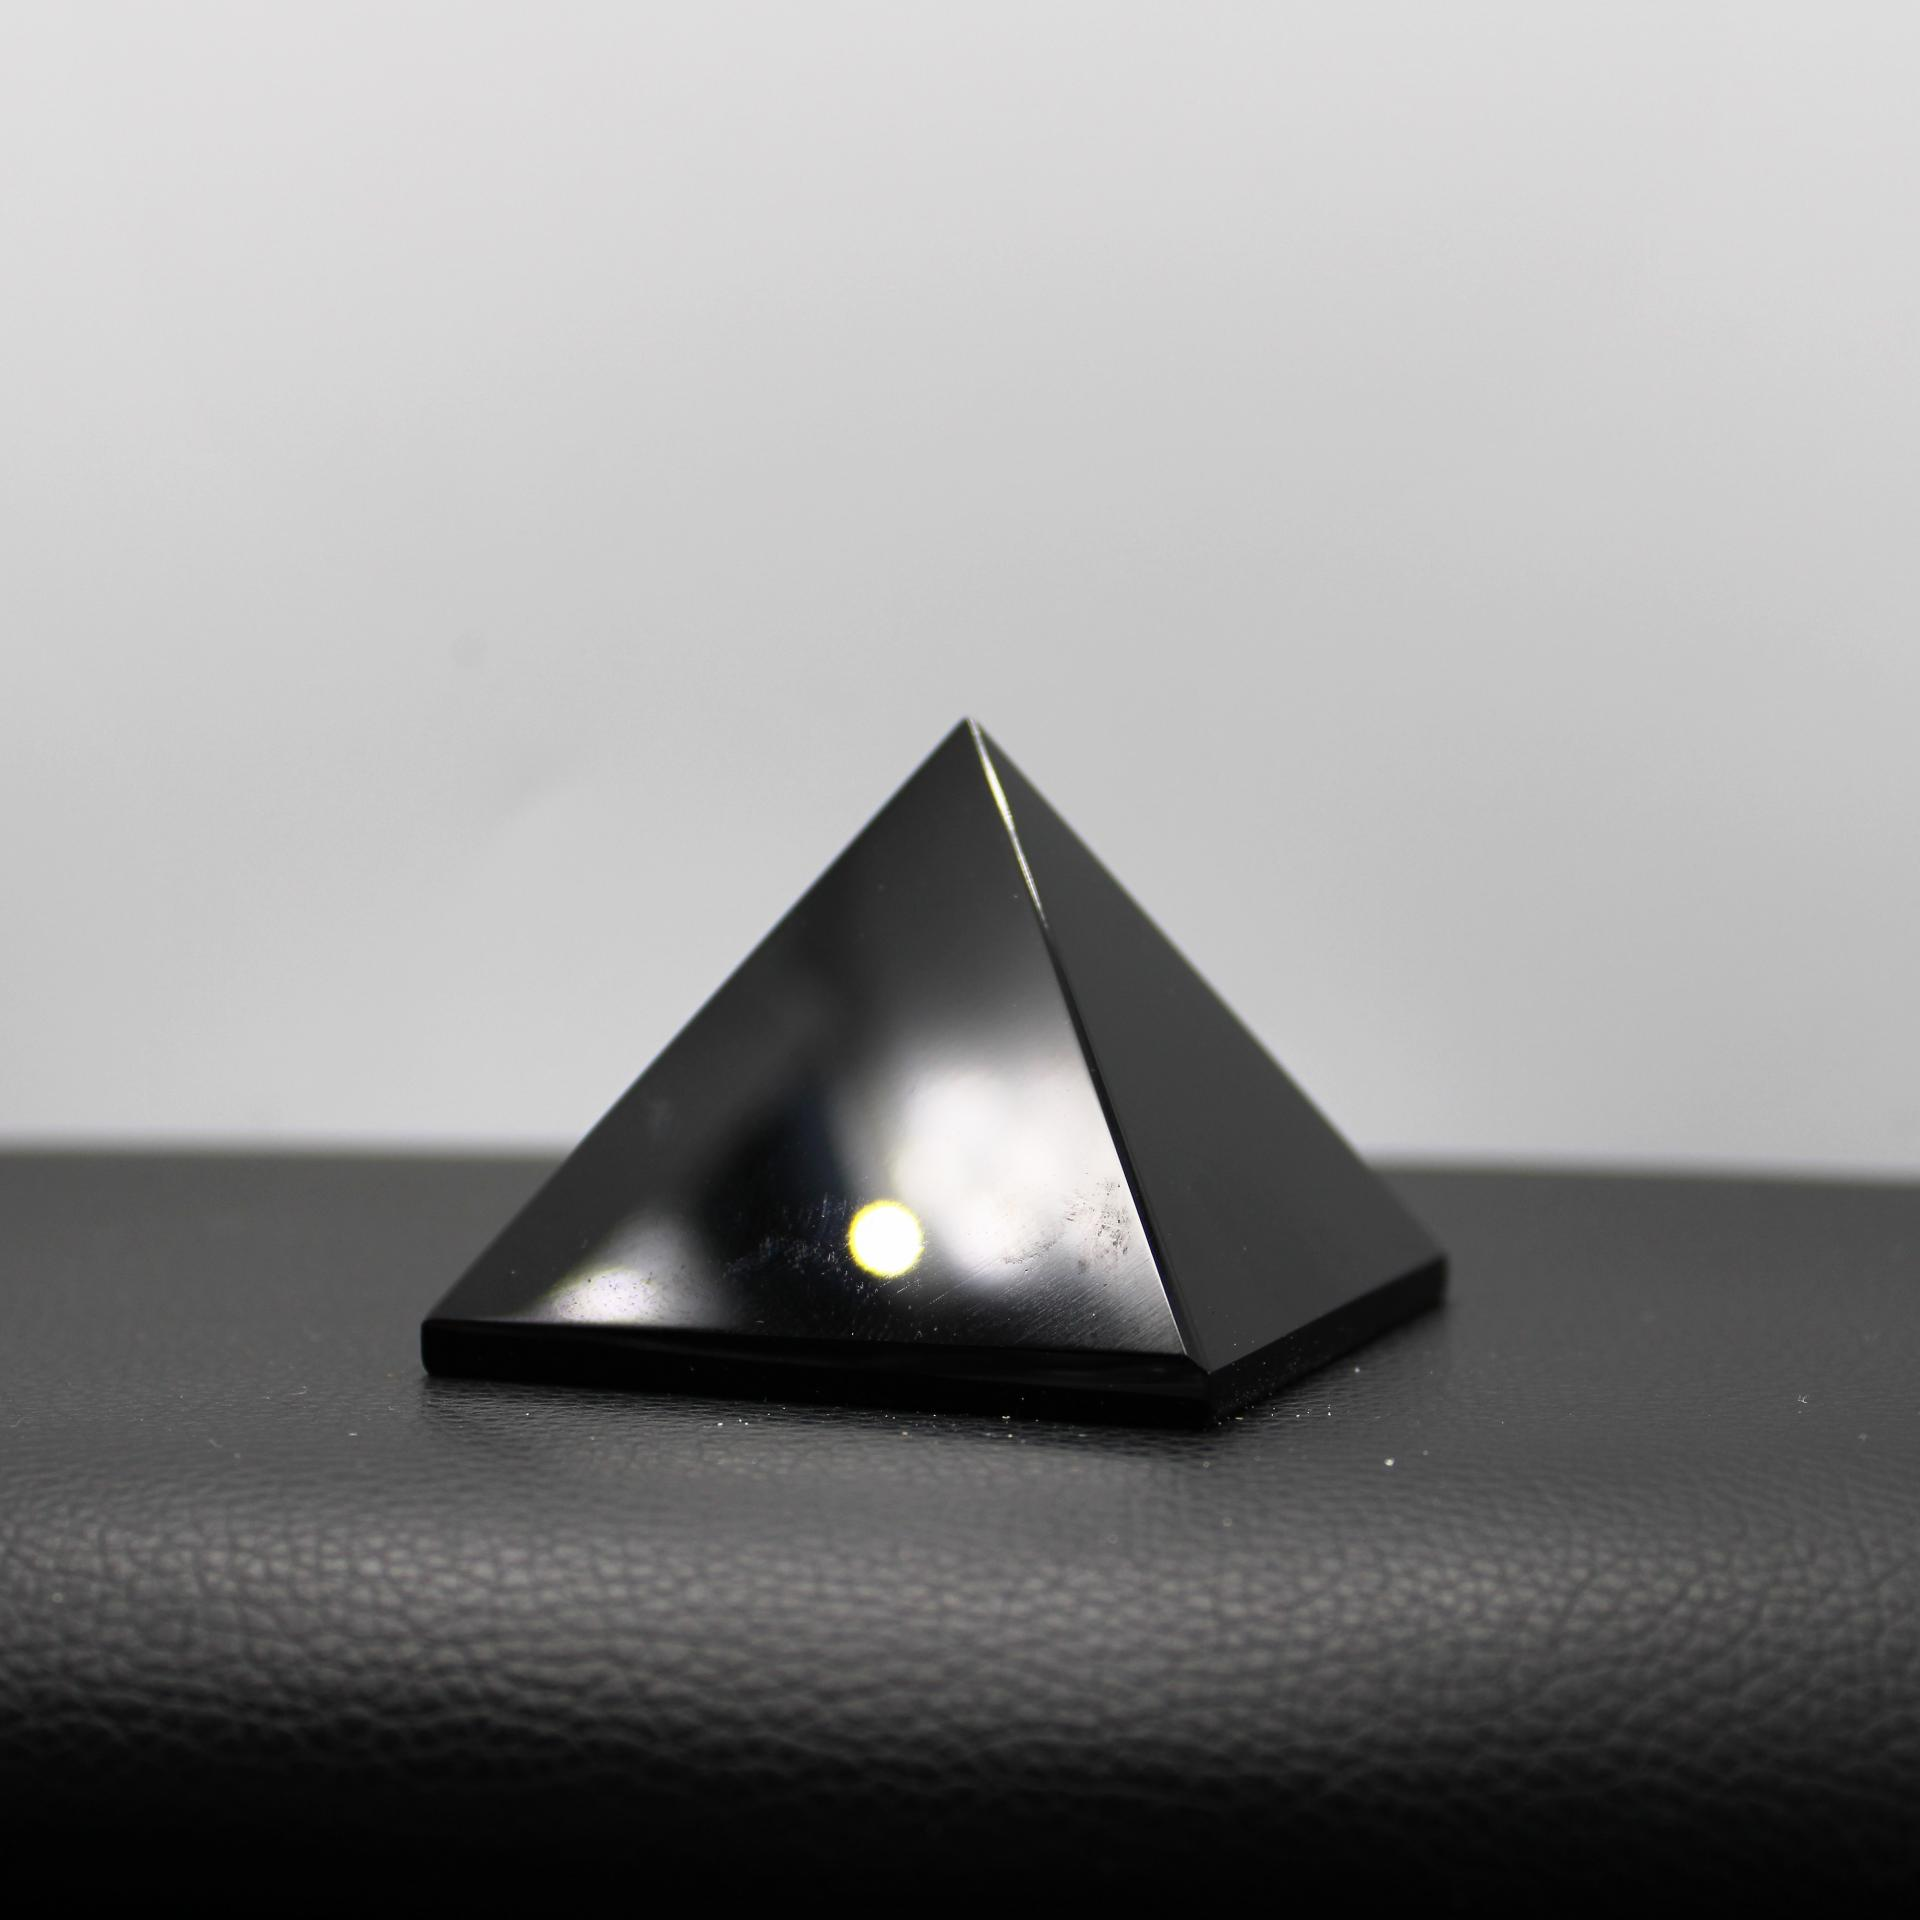 Pyramide Shungite lessenceau1000pendules 108